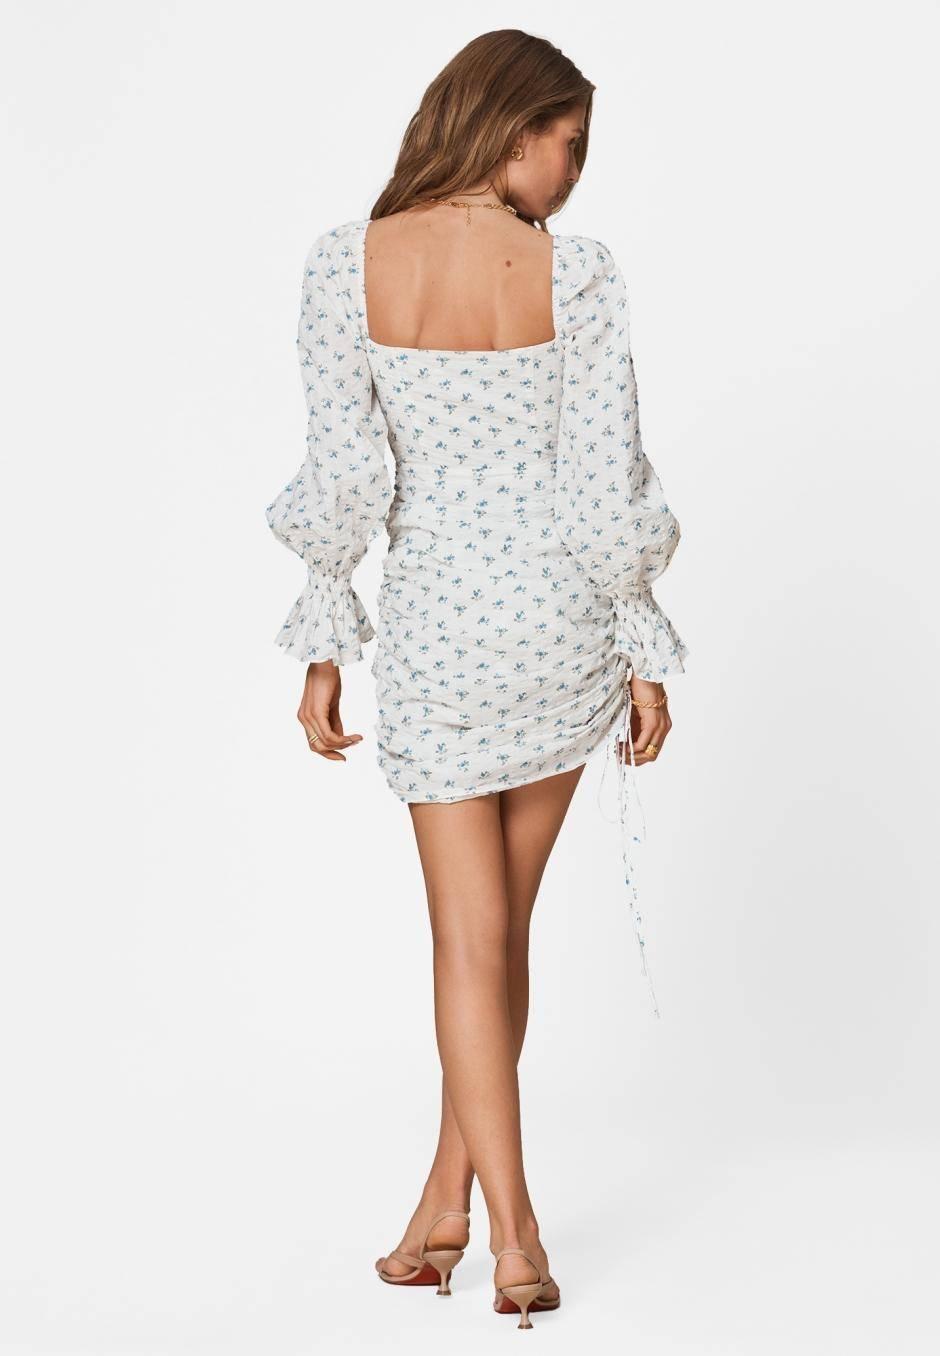 Adoore Capri Dress